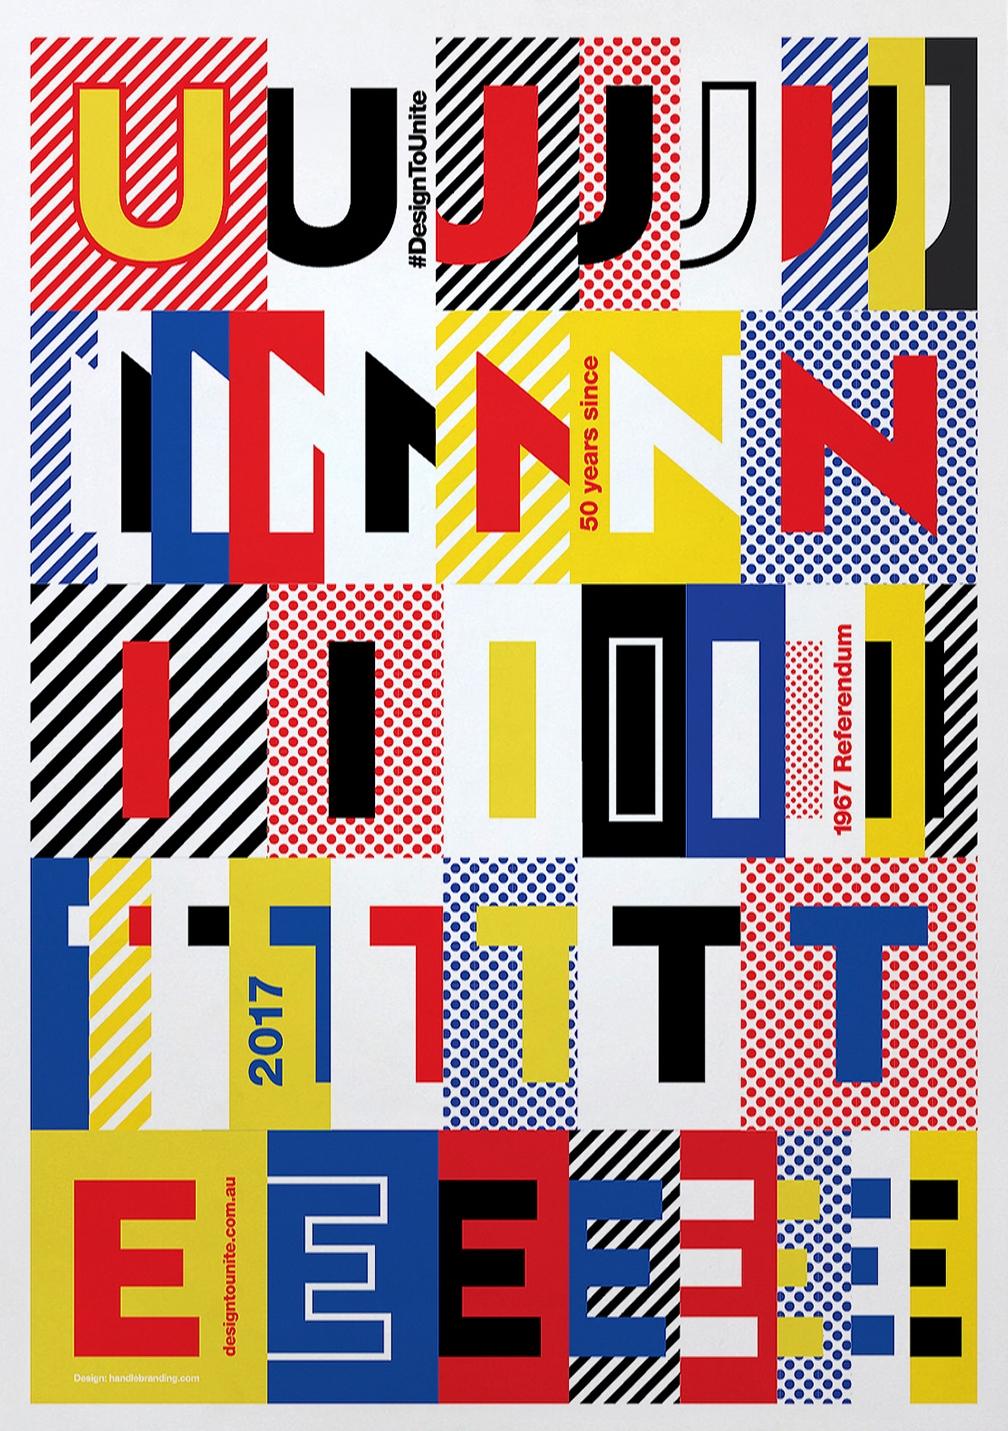 Cover_Handle-Branding-Design-To-Unite-Poster-Design-Australia.jpg